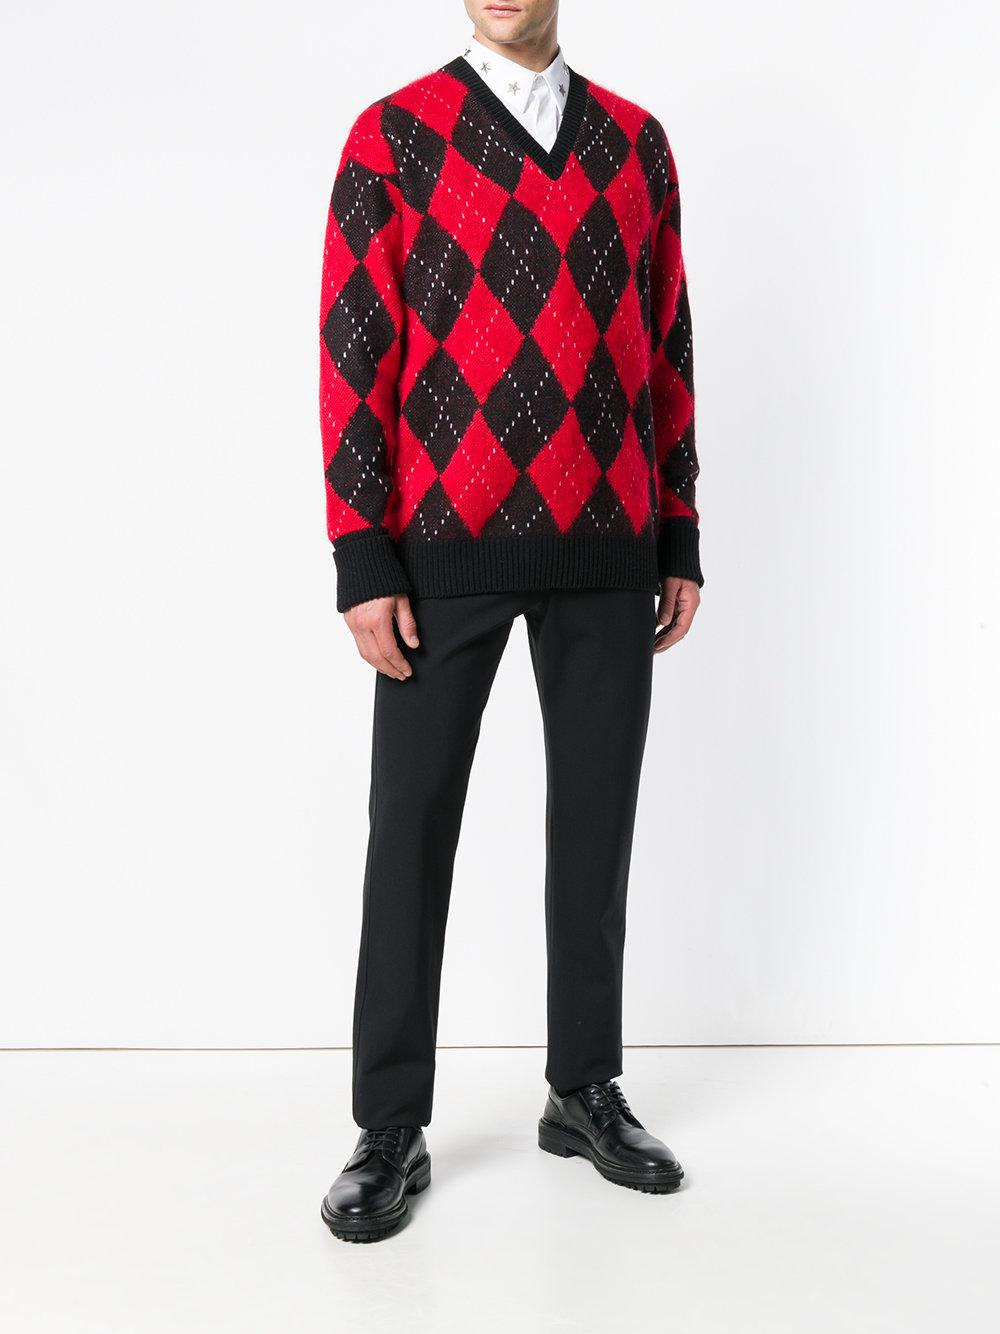 931589f0236cc6 Alexander McQueen Argyle Knit Sweater in Black for Men - Lyst